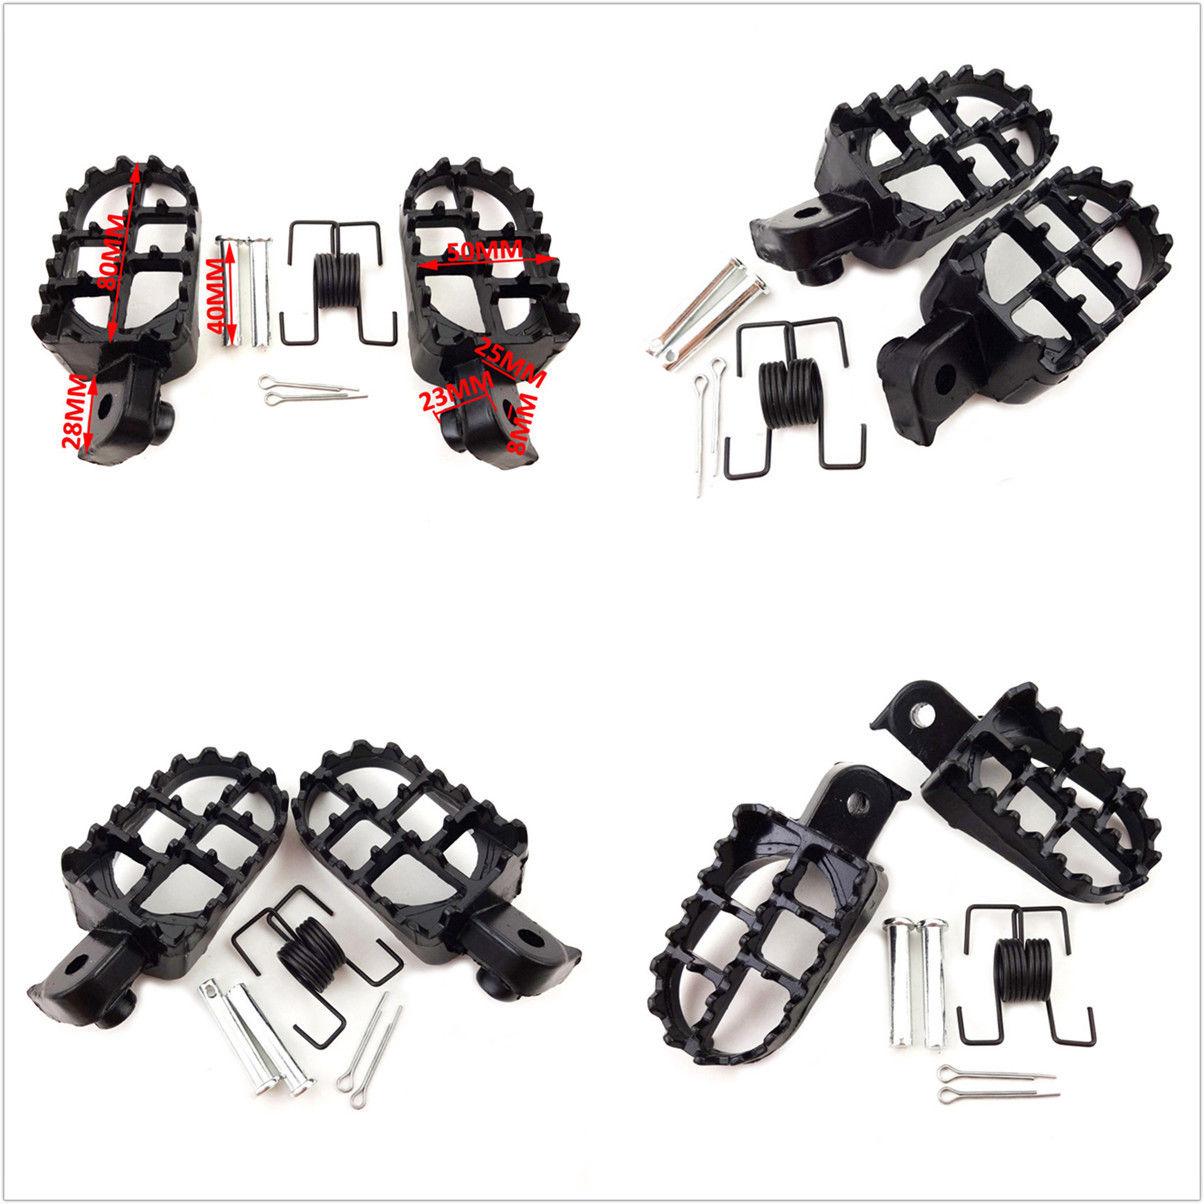 2 Pcs Black Brand New And High Quality Motocross Bike Racing Foot Pegs Aluminium Pedal Pads MX Racing Style Design